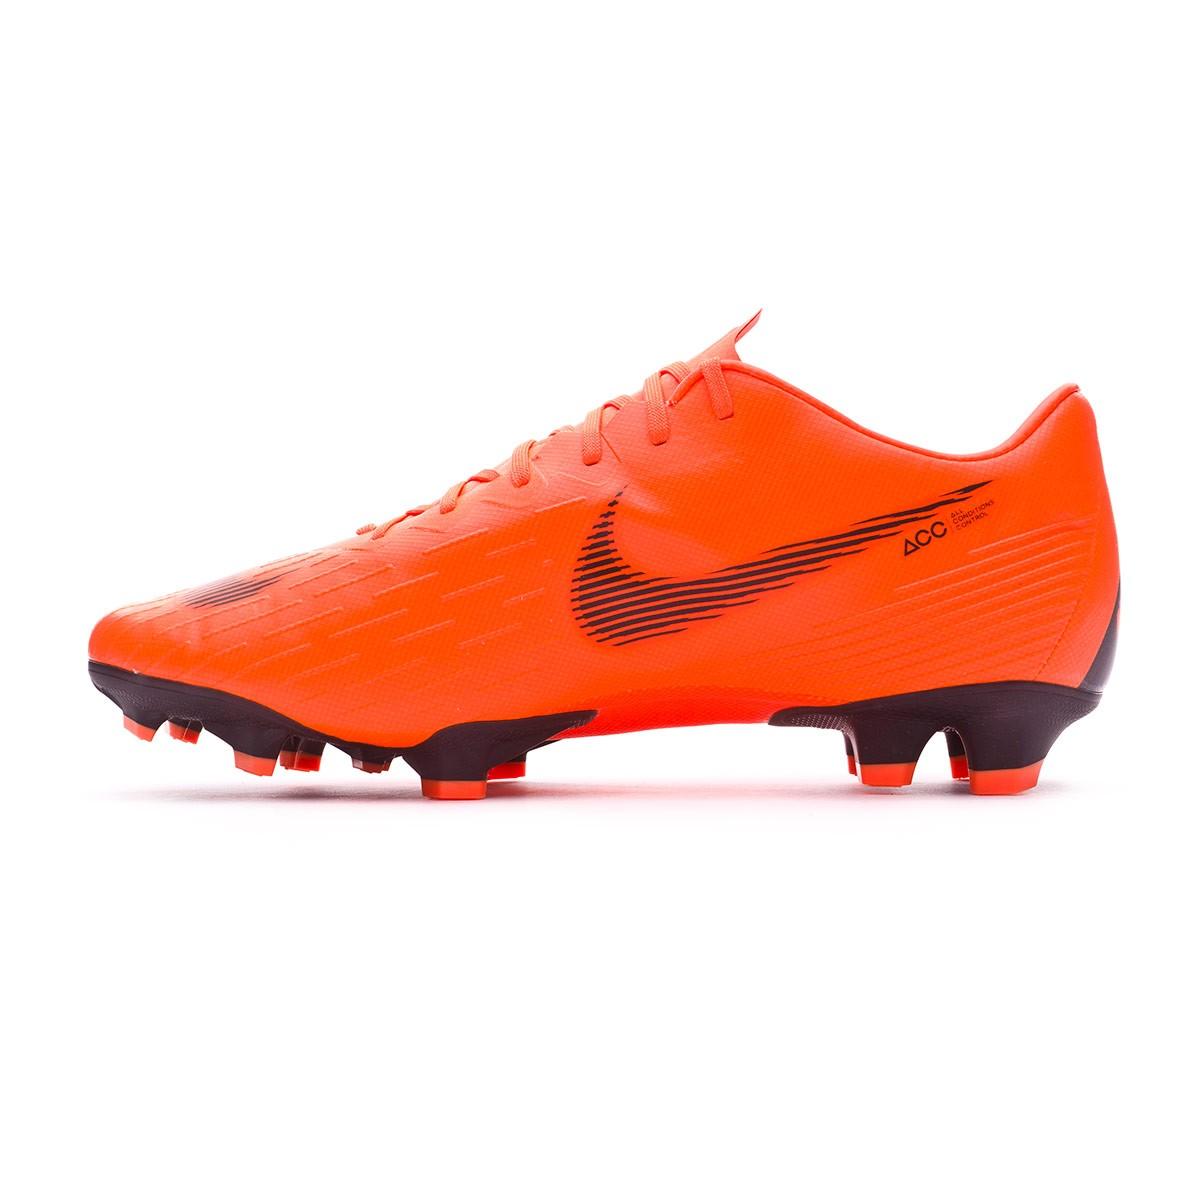 Chuteira Nike Mercurial Vapor XII Pro FG Total orange-Black-Volt - Loja de  futebol Fútbol Emotion 5e5be592c5fc3